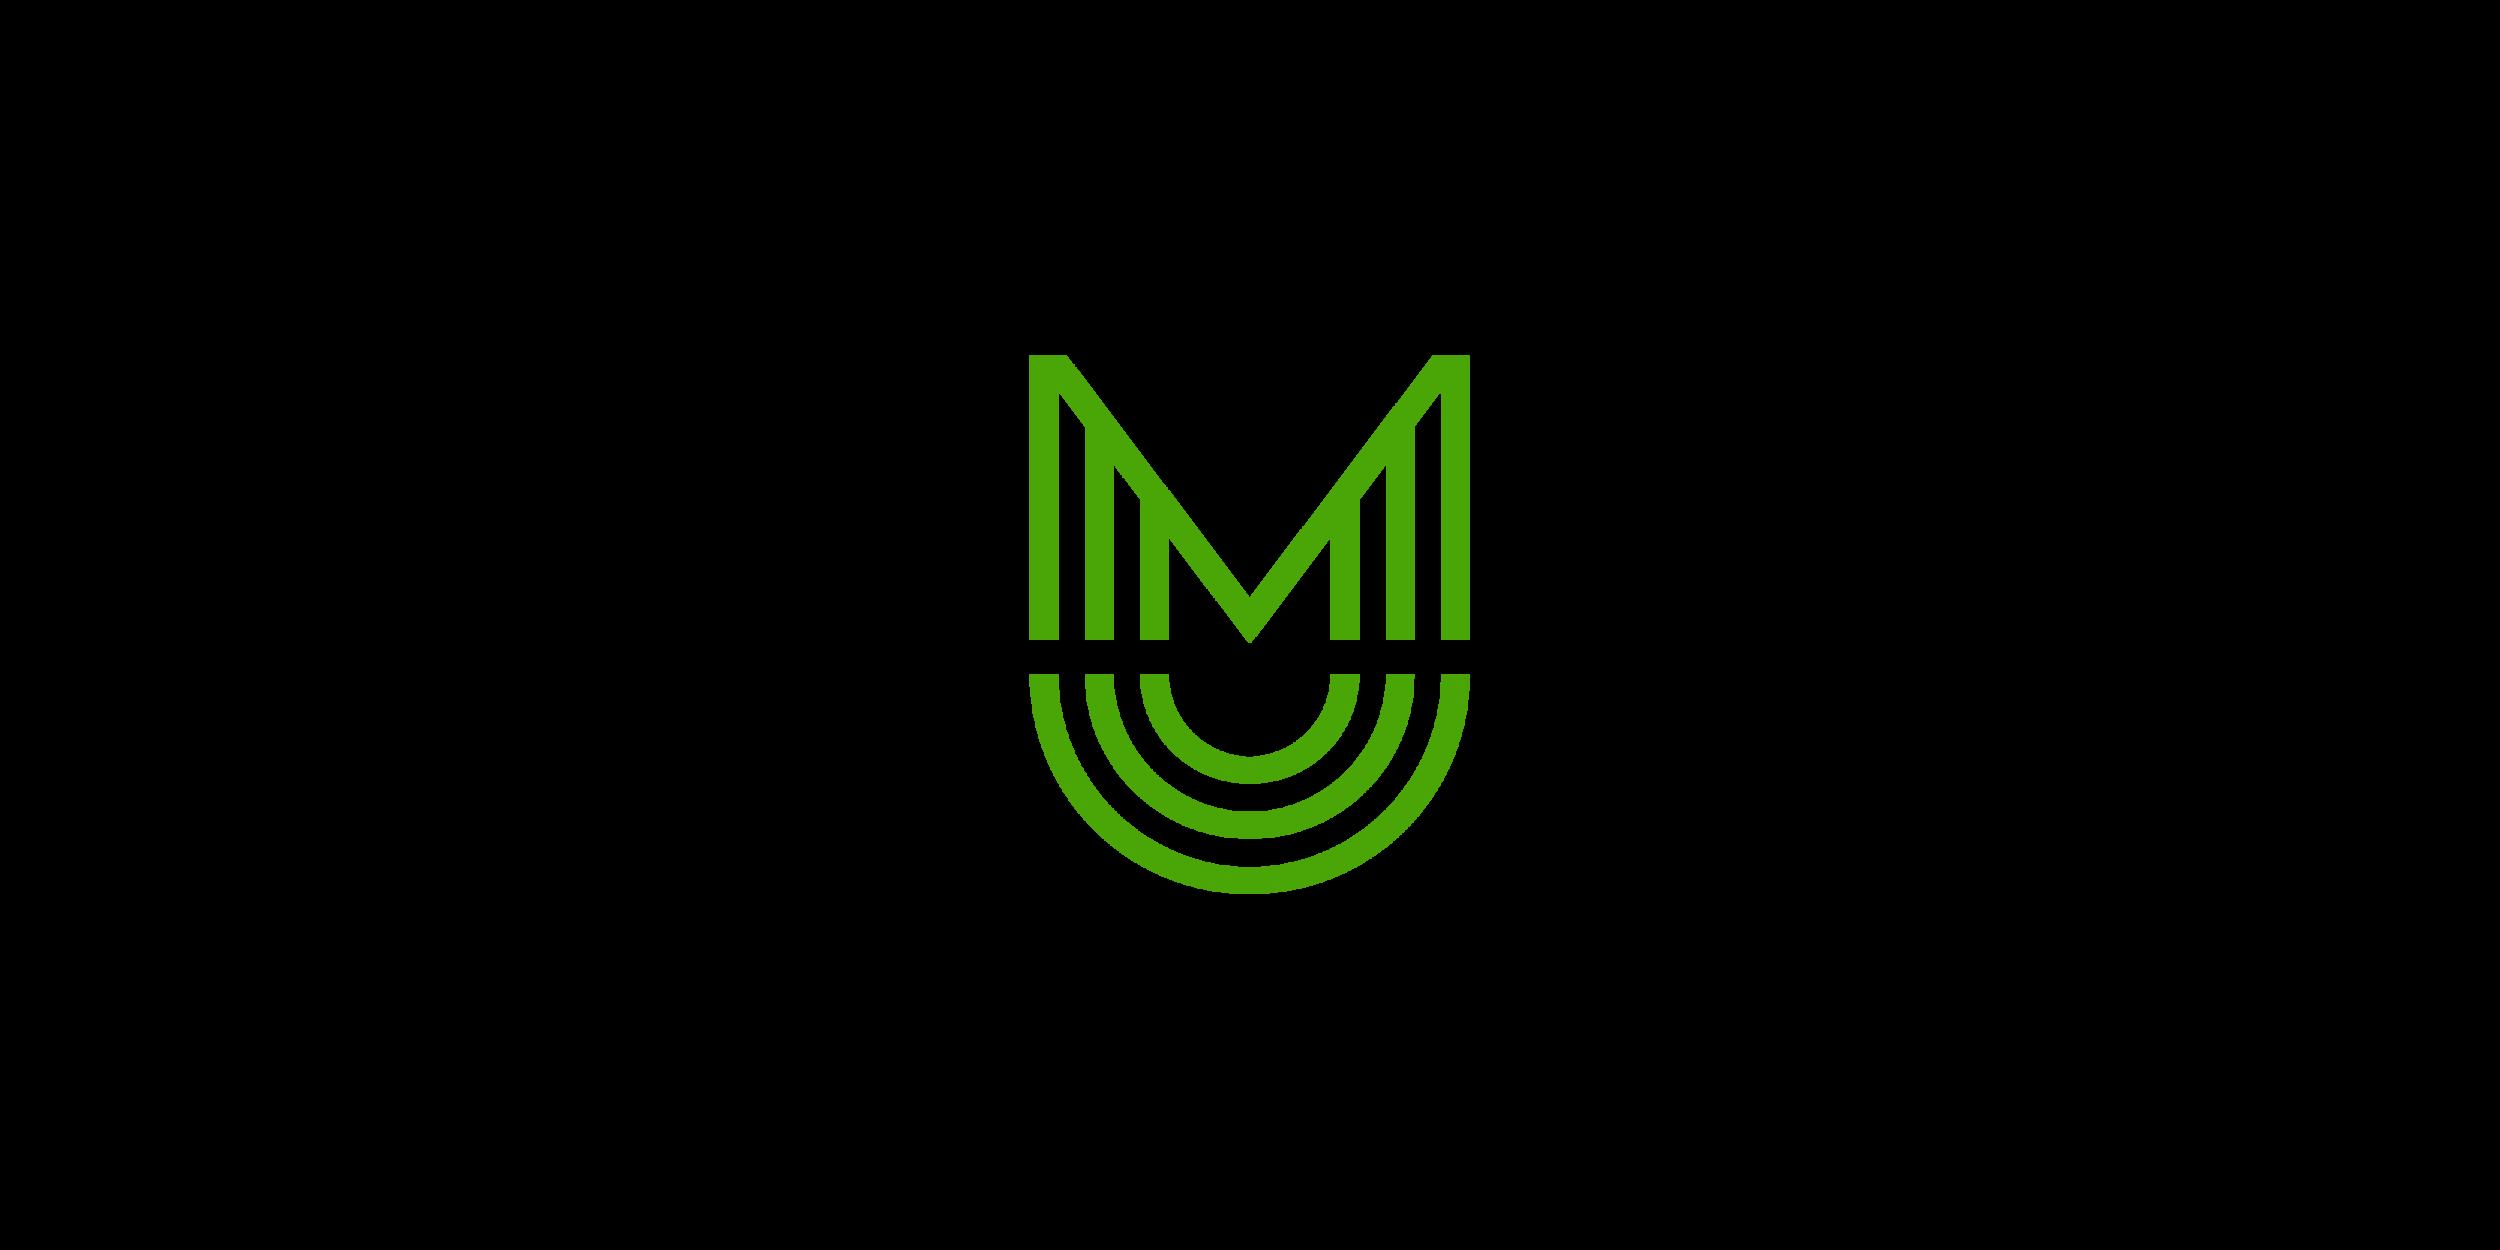 MyBOCA_Logo_Assets_Primary_Logo_Primary_Mongoram_Aguacate.png